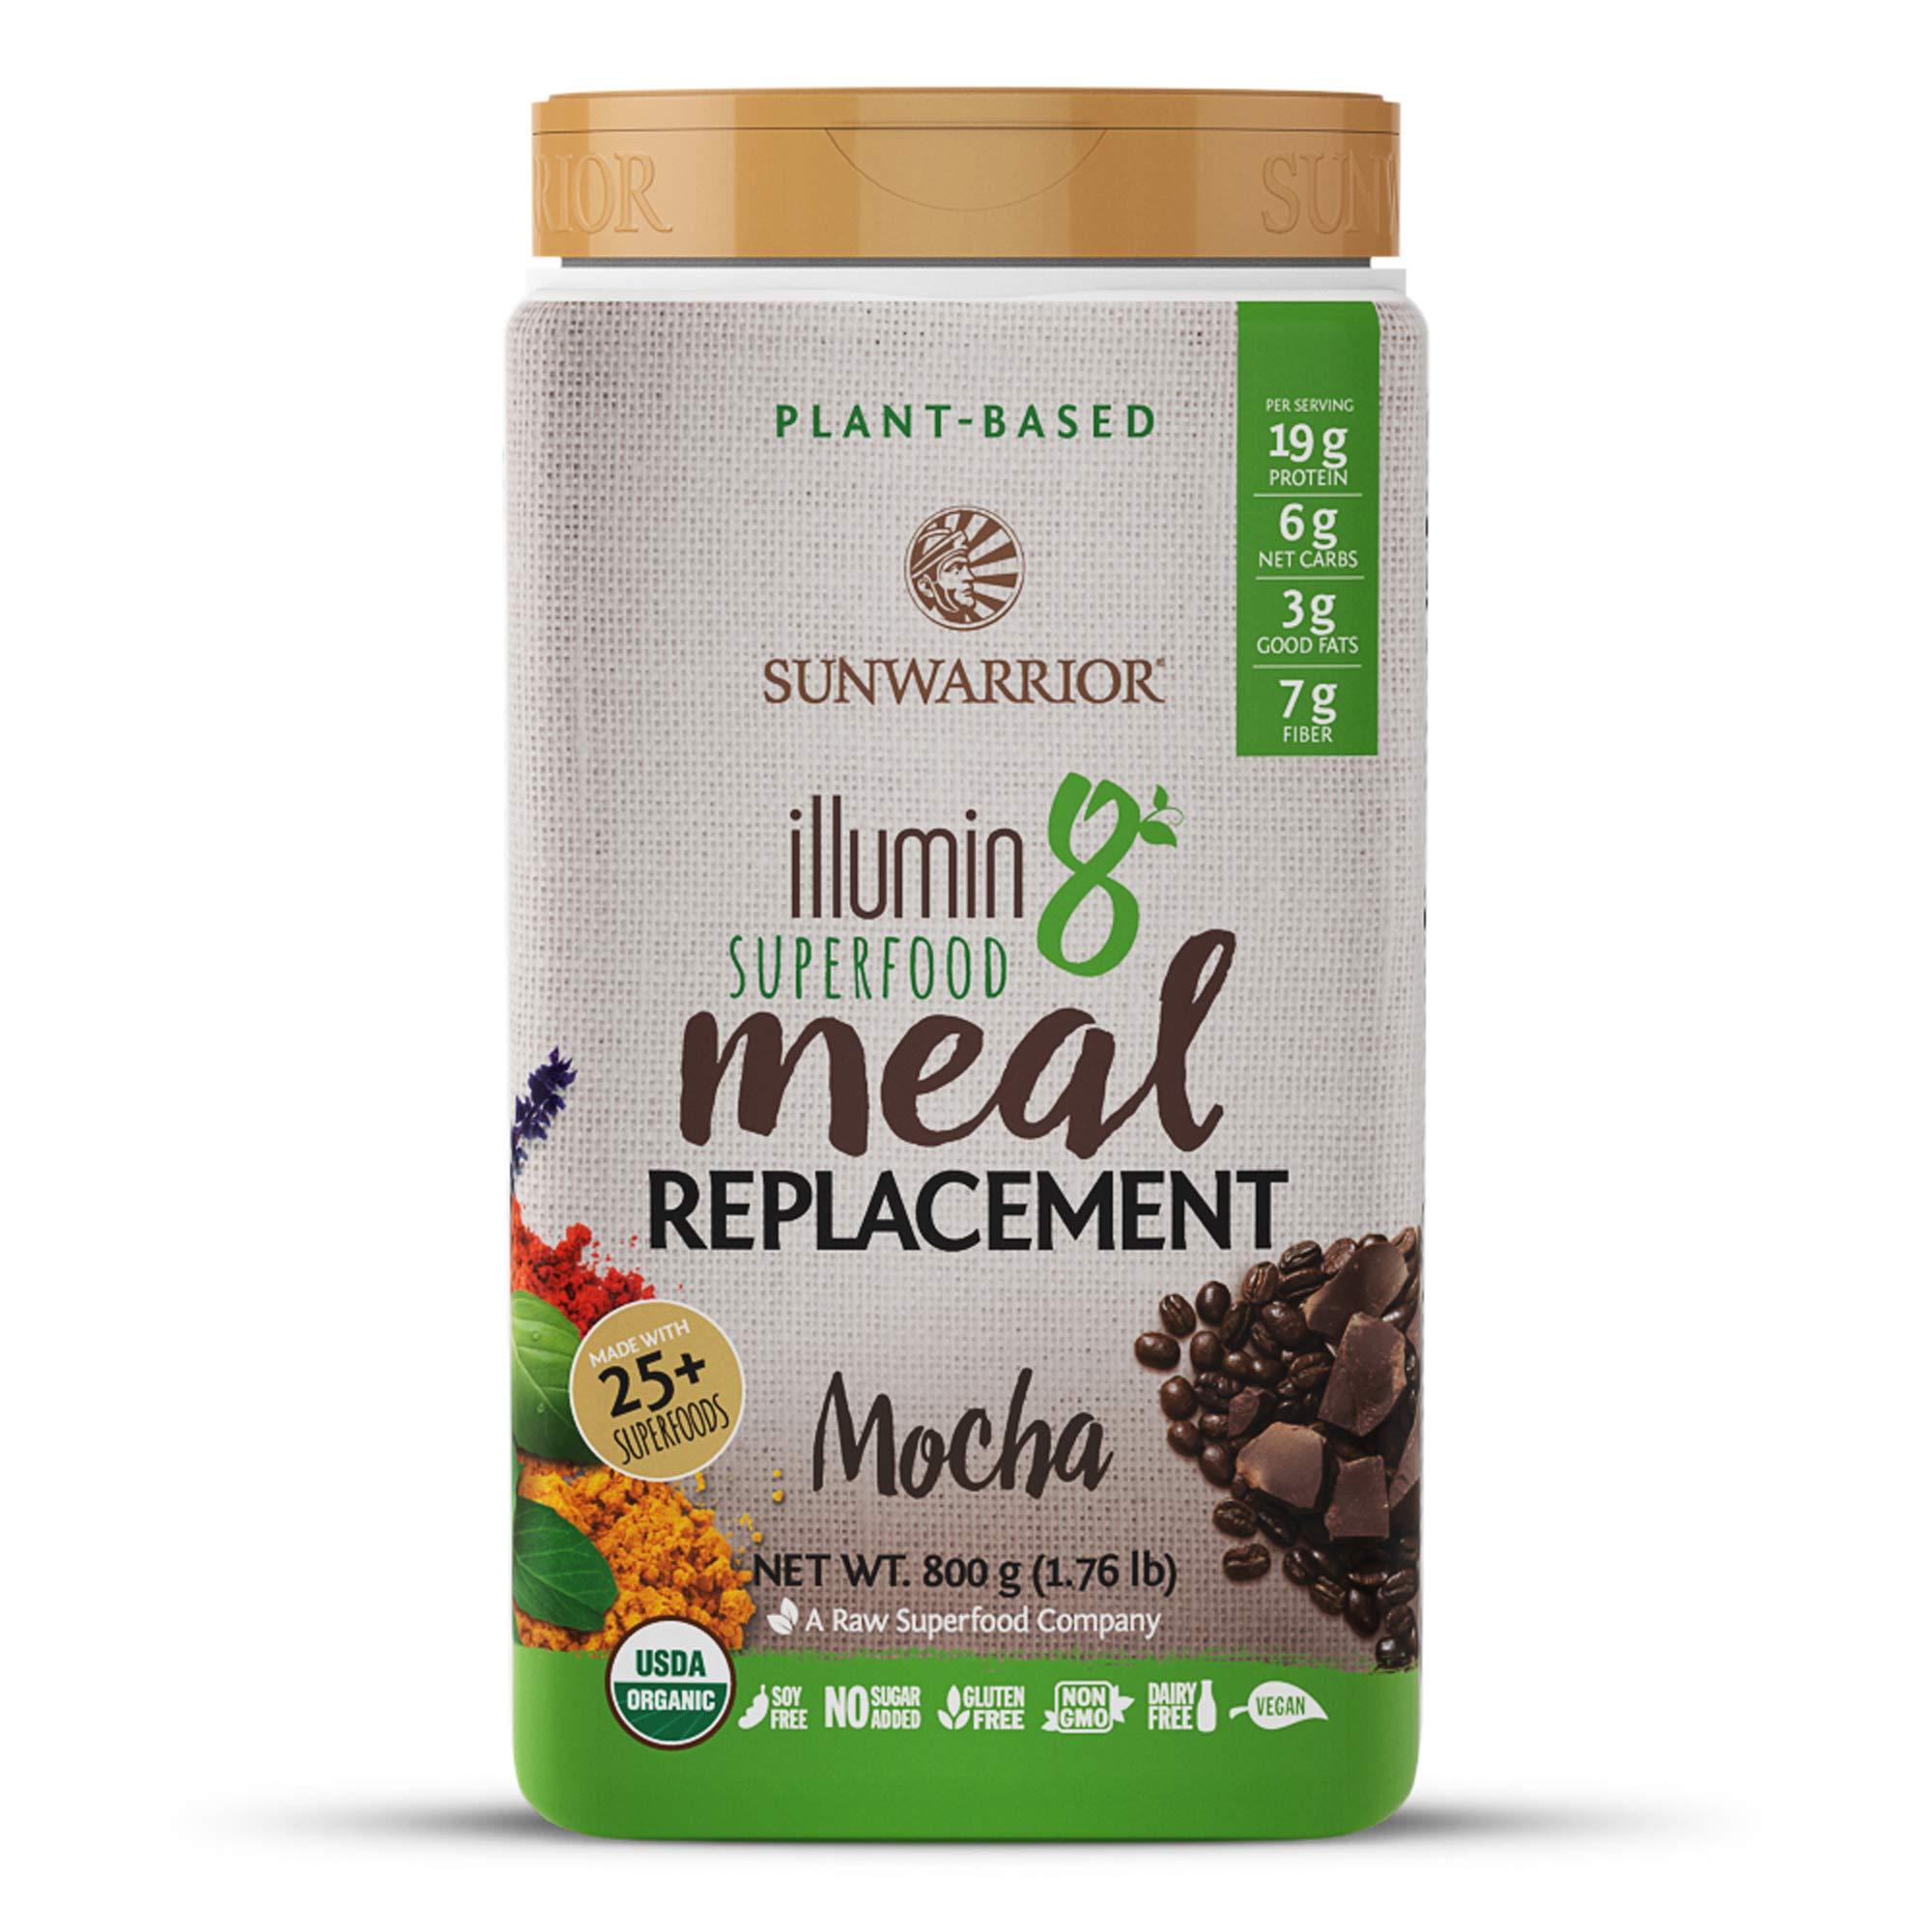 Sunwarrior - Illumin8 Plant-Based Superfood Meal Replacement, Organic, Vegan, Non-GMO (Mocha, 20 Servings)